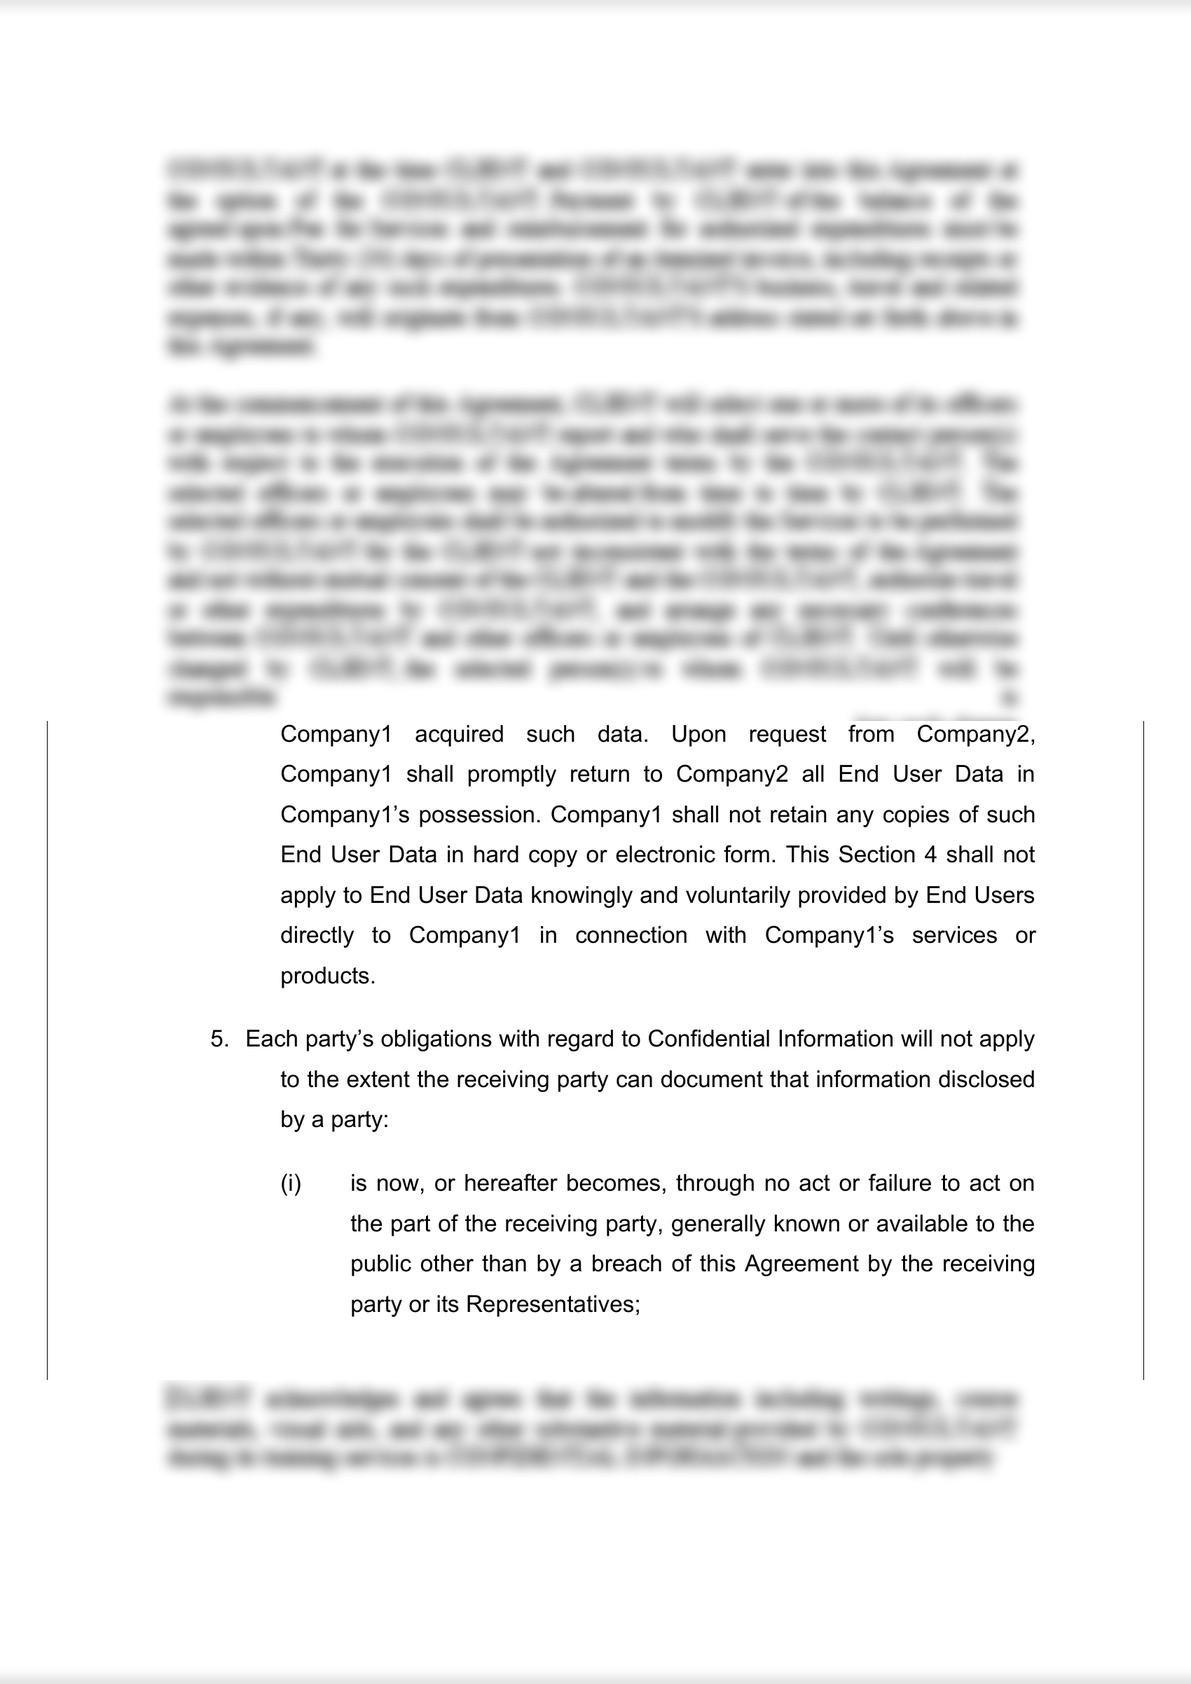 Mutual Non-Disclosure Agreement-2